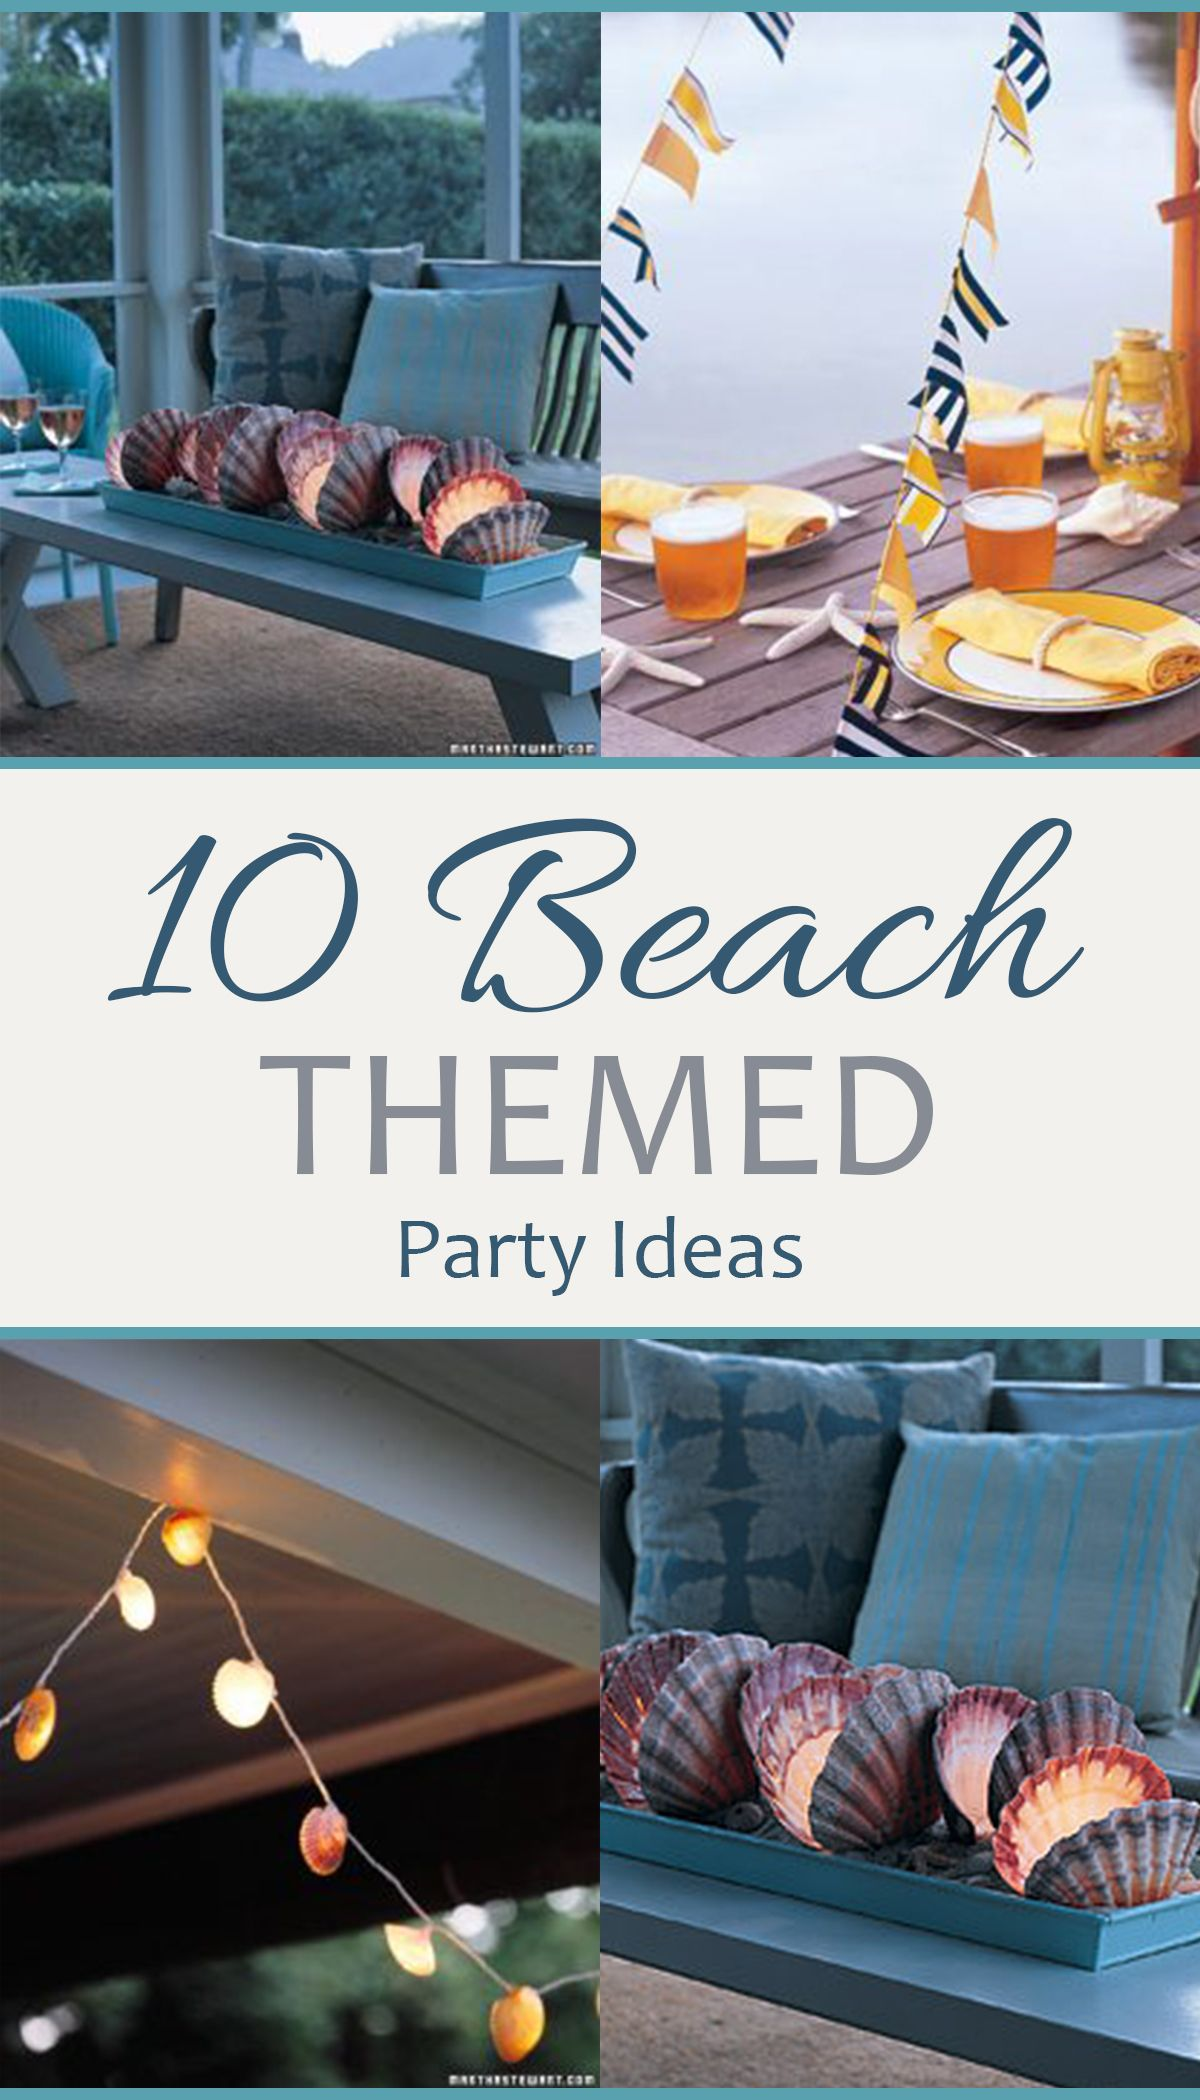 Beach Themed Party Ideas, Beach Party Ideas, Coastal Parties, Outdoor